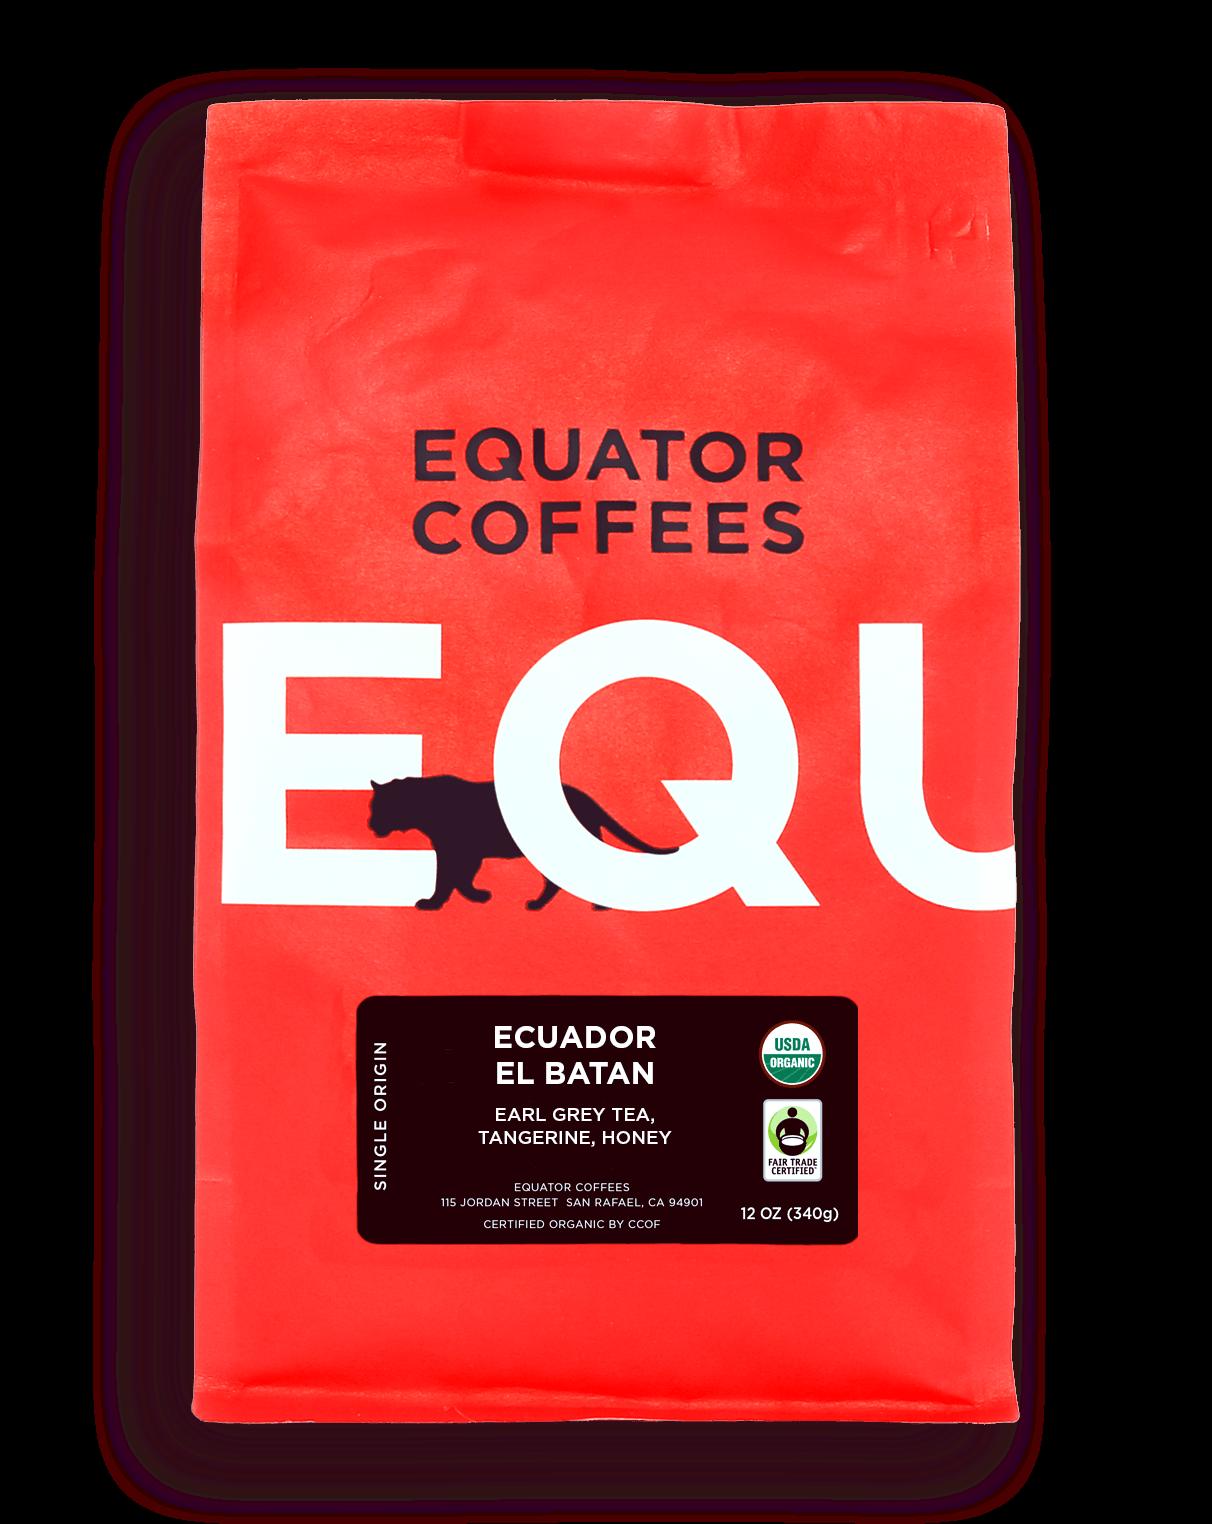 Ecuador El Batan Fair Trade Organic